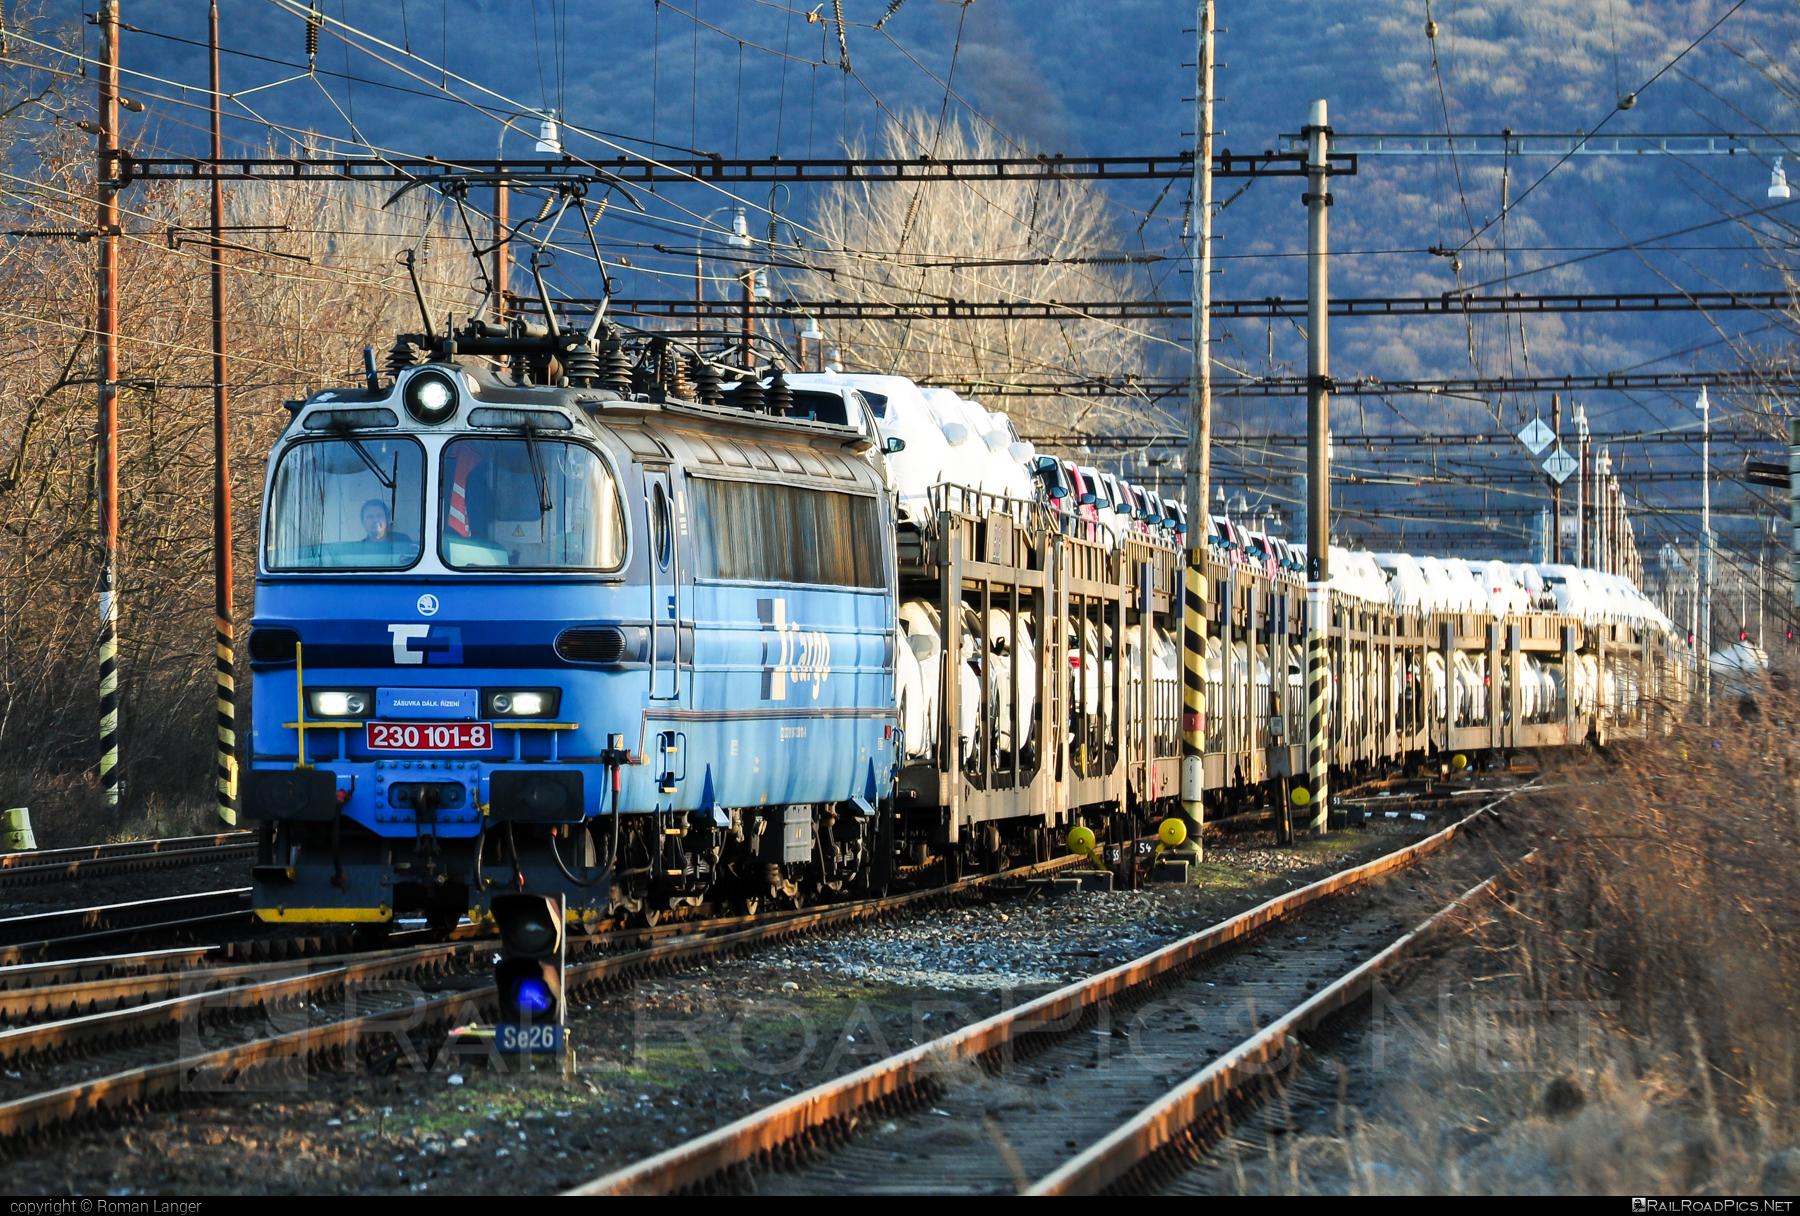 Škoda 47E - 230 101-8 operated by ČD Cargo, a.s. #carcarrierwagon #cdcargo #laminatka #locomotive240 #skoda #skoda47e